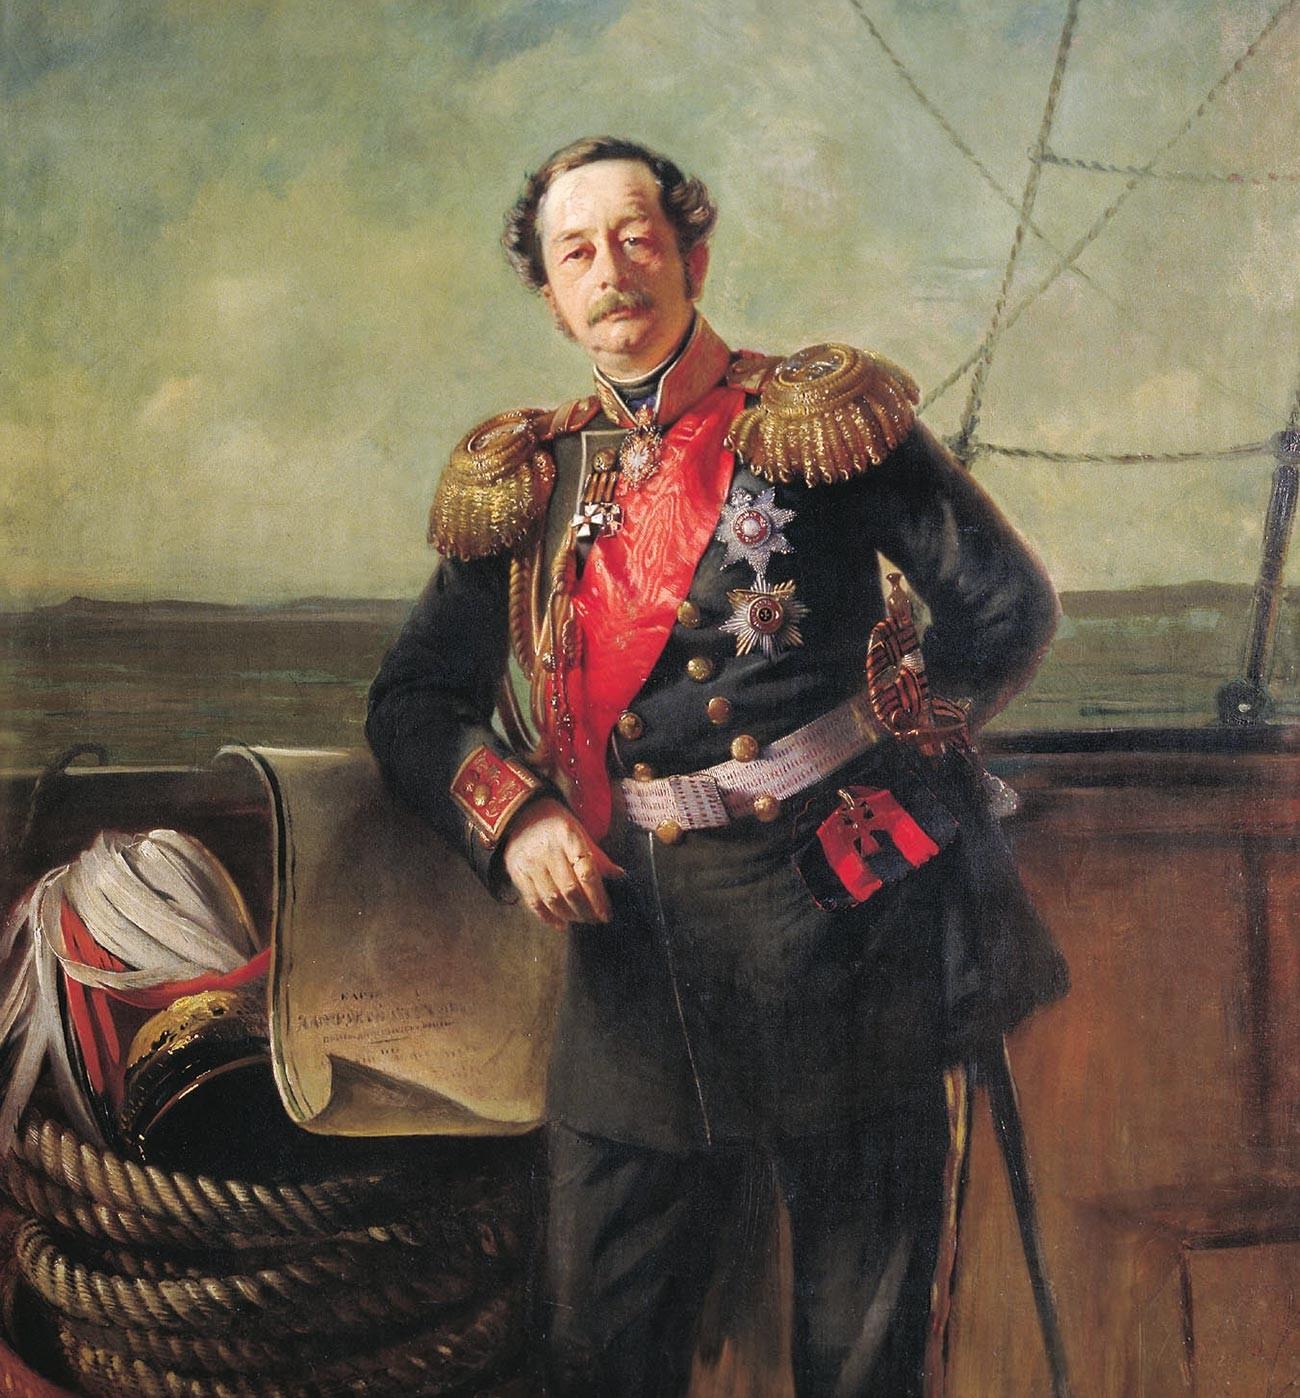 Porträt des Grafen Nikolai Murawjow-Amurski